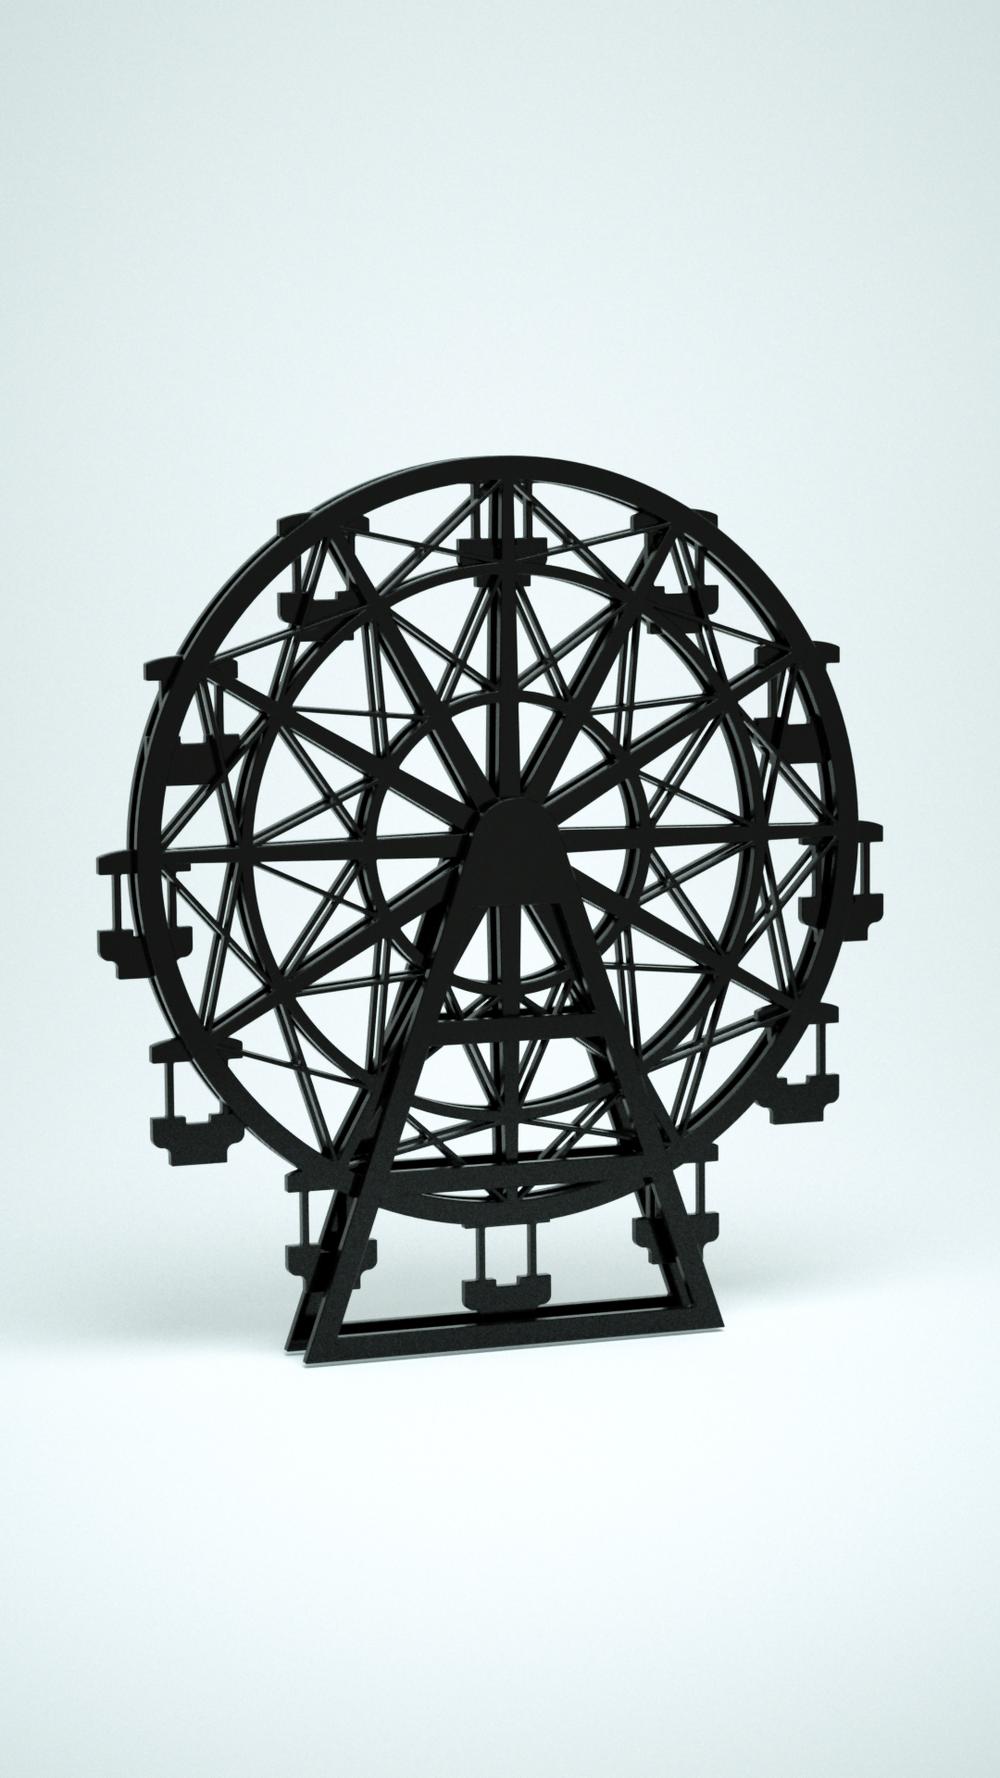 Ferris Wheel, Black